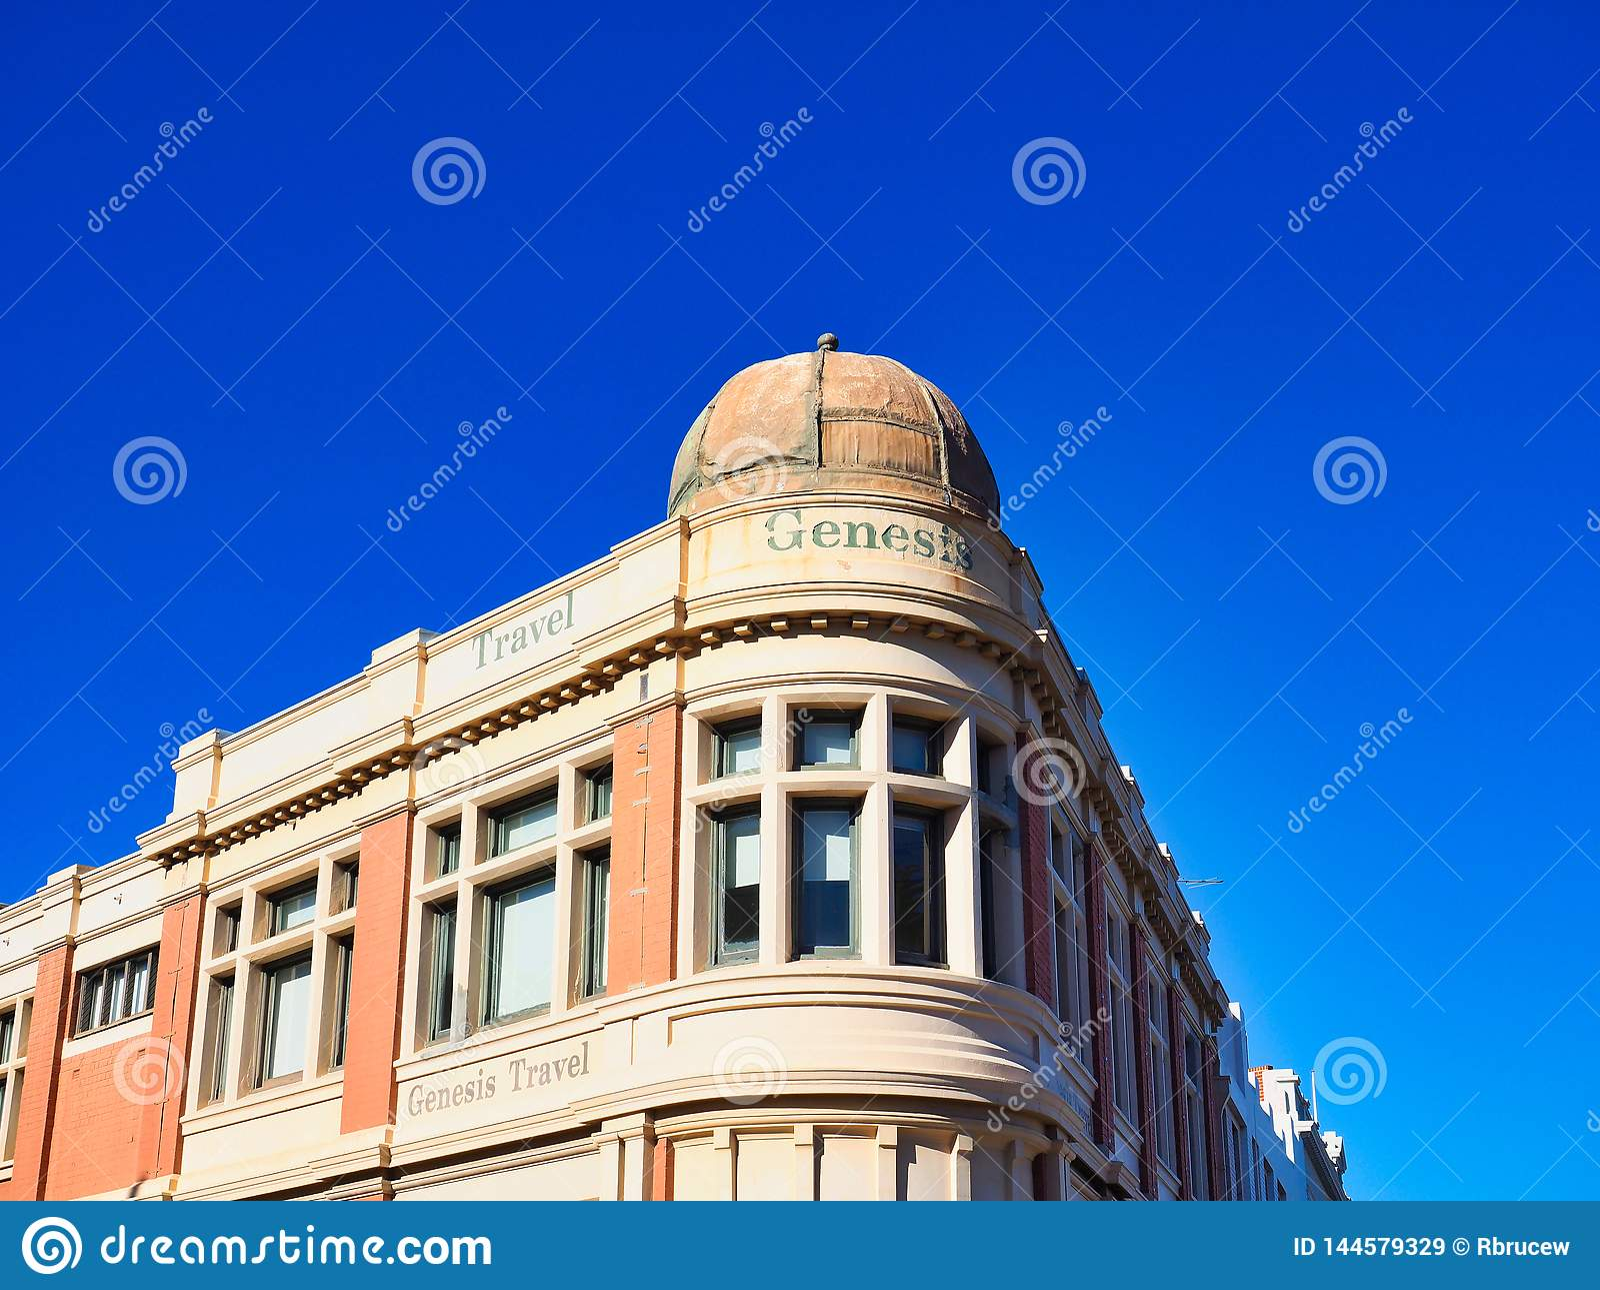 Historic Travel Company Building, Fremantle, Western Australia